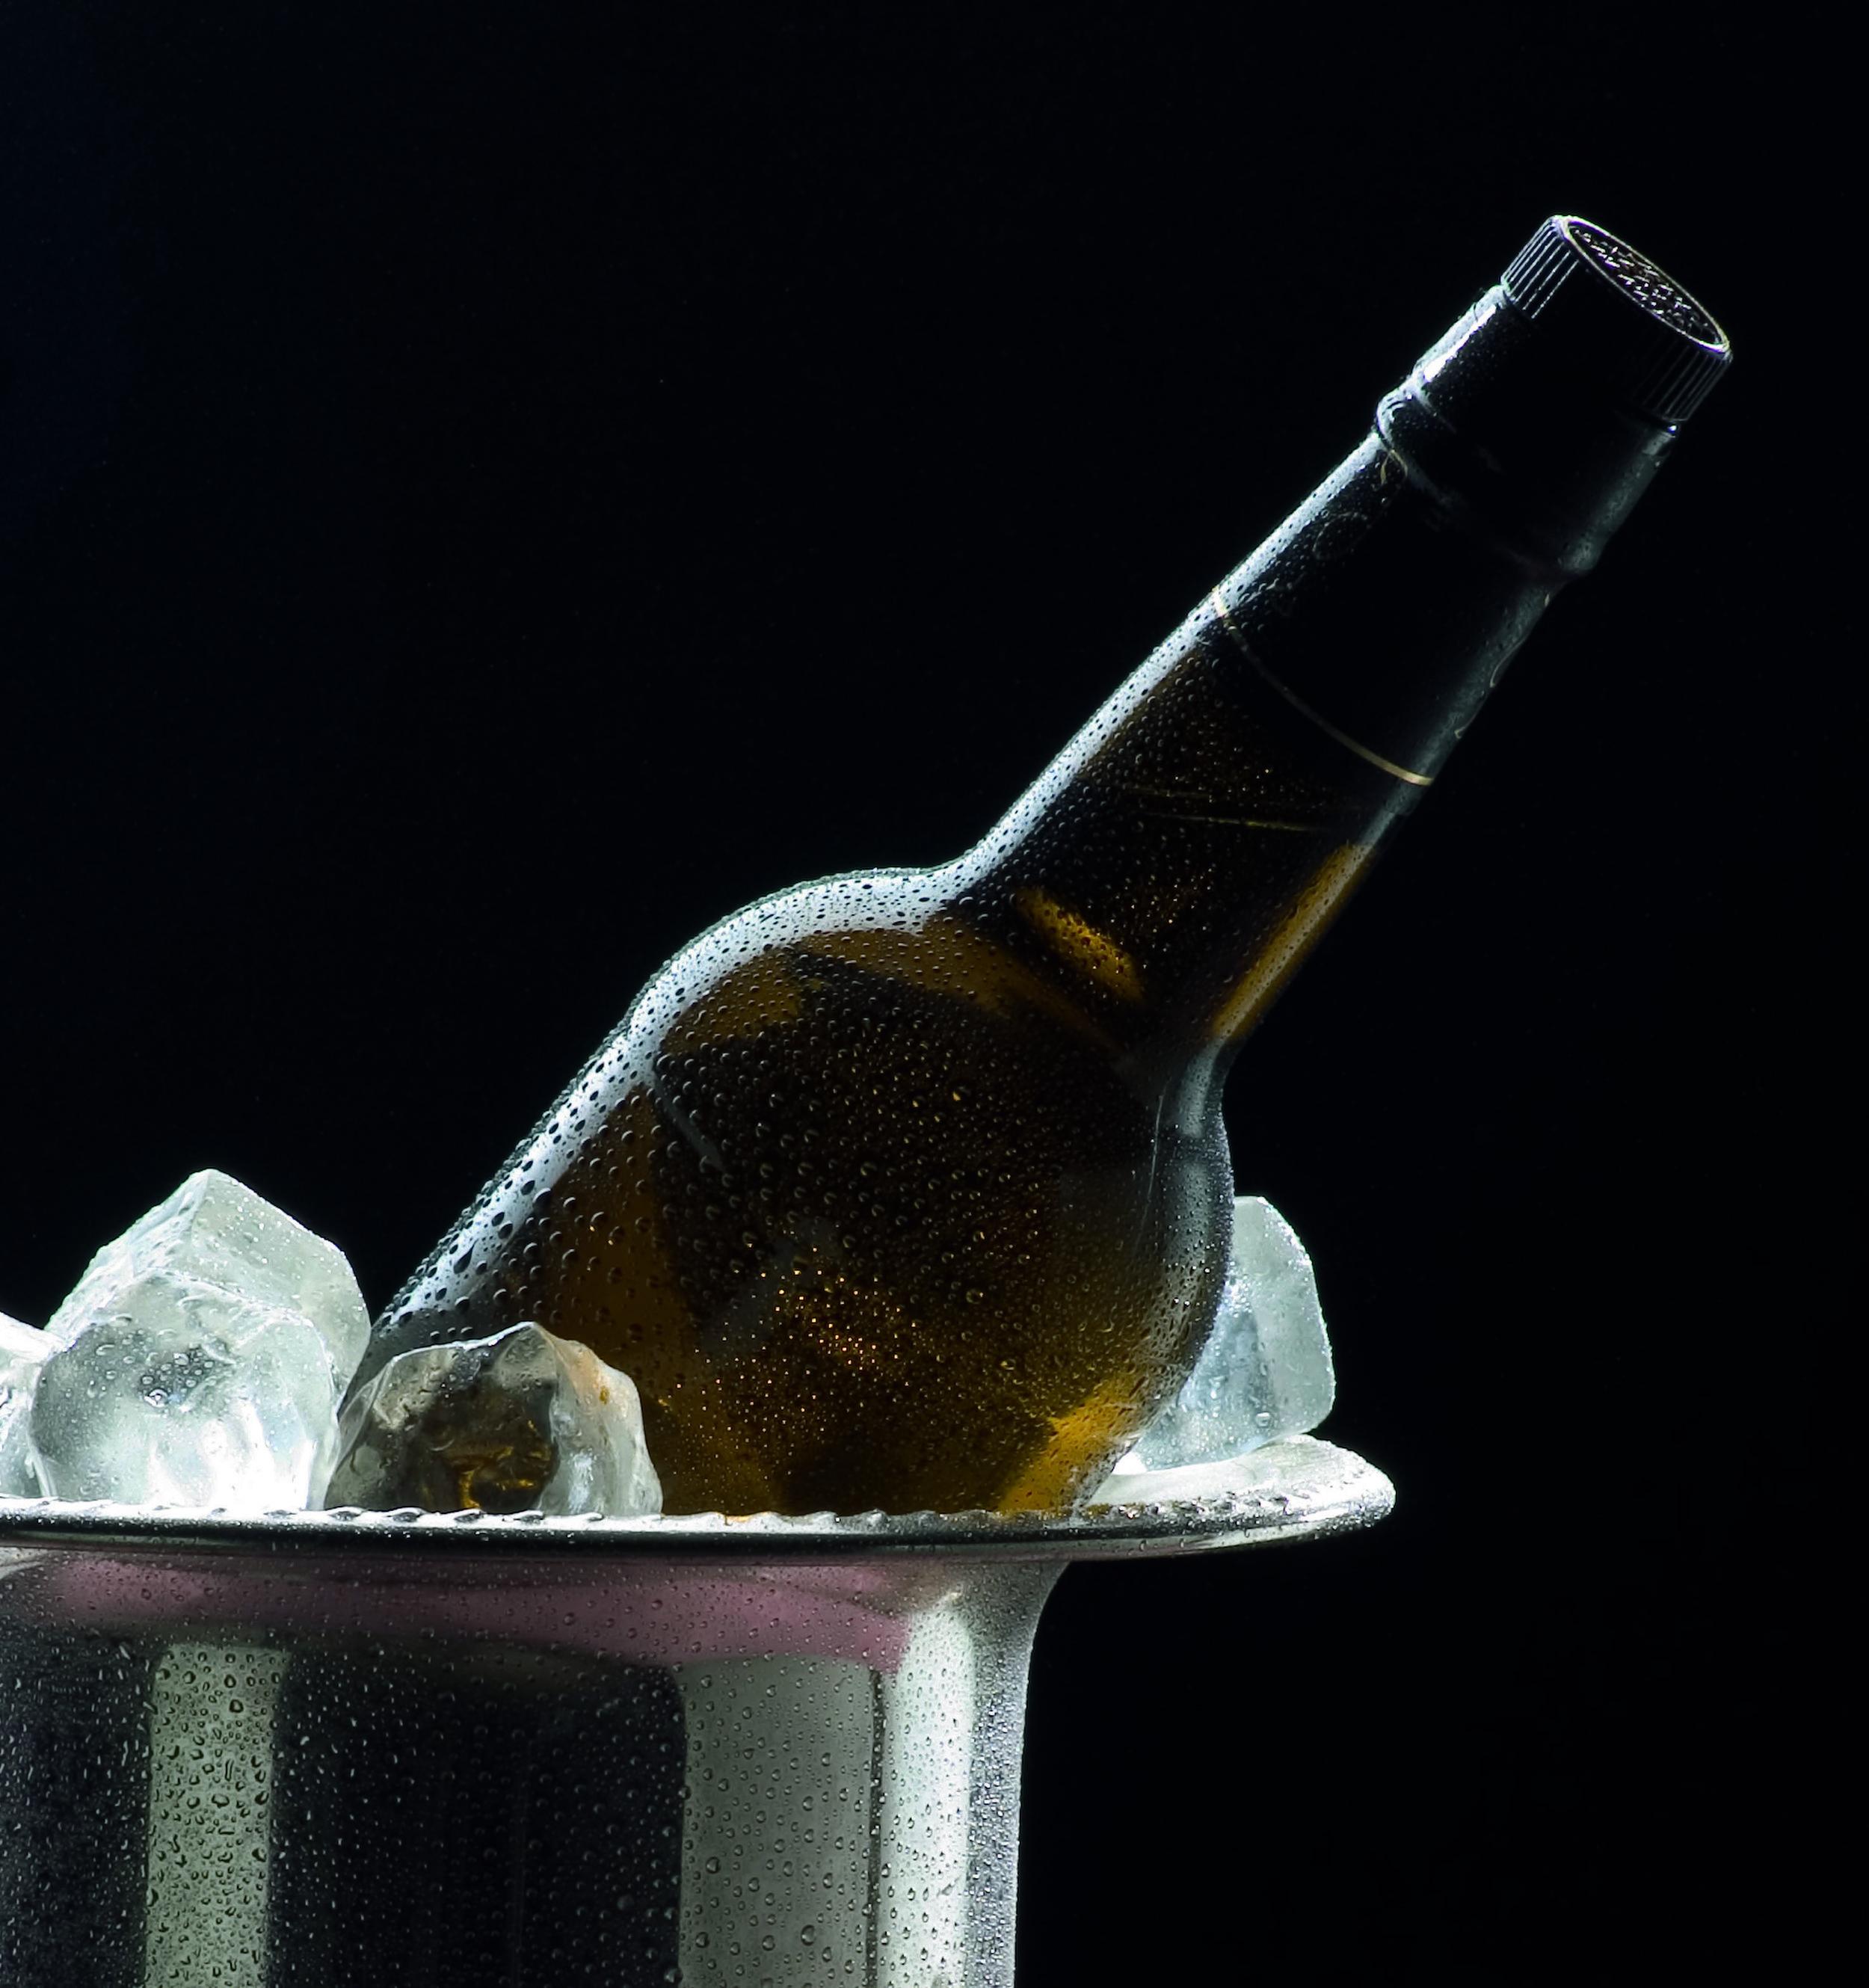 vinos_jerez_sherry_wines_consumo_-_fino_en_cubitera.jpg